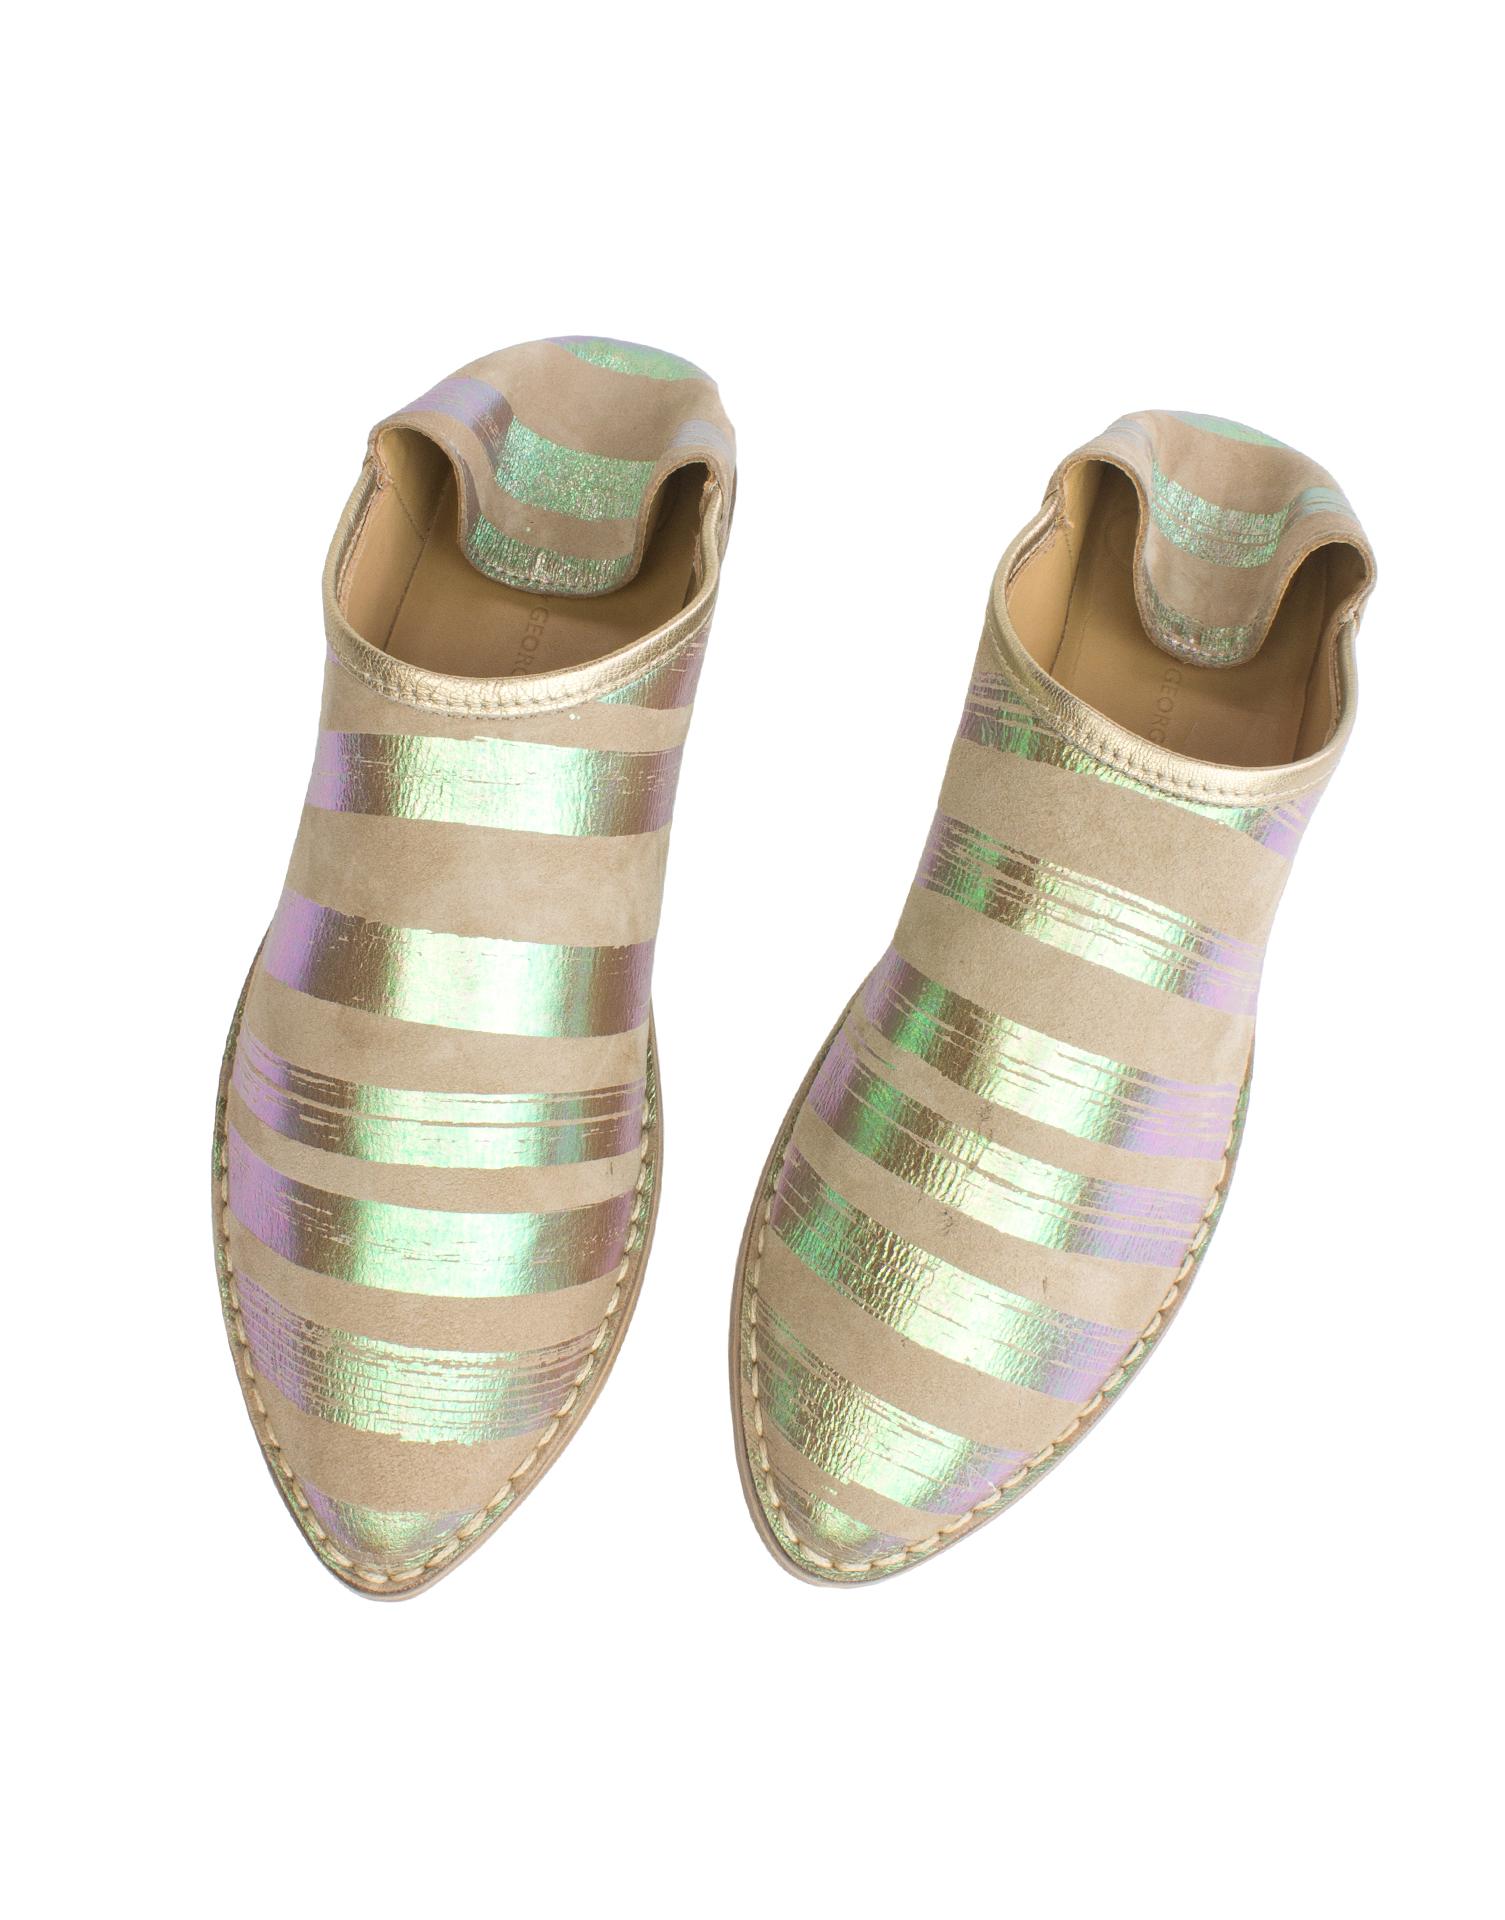 Georgina Goodman - Buff & Iridescent Striped Slipper